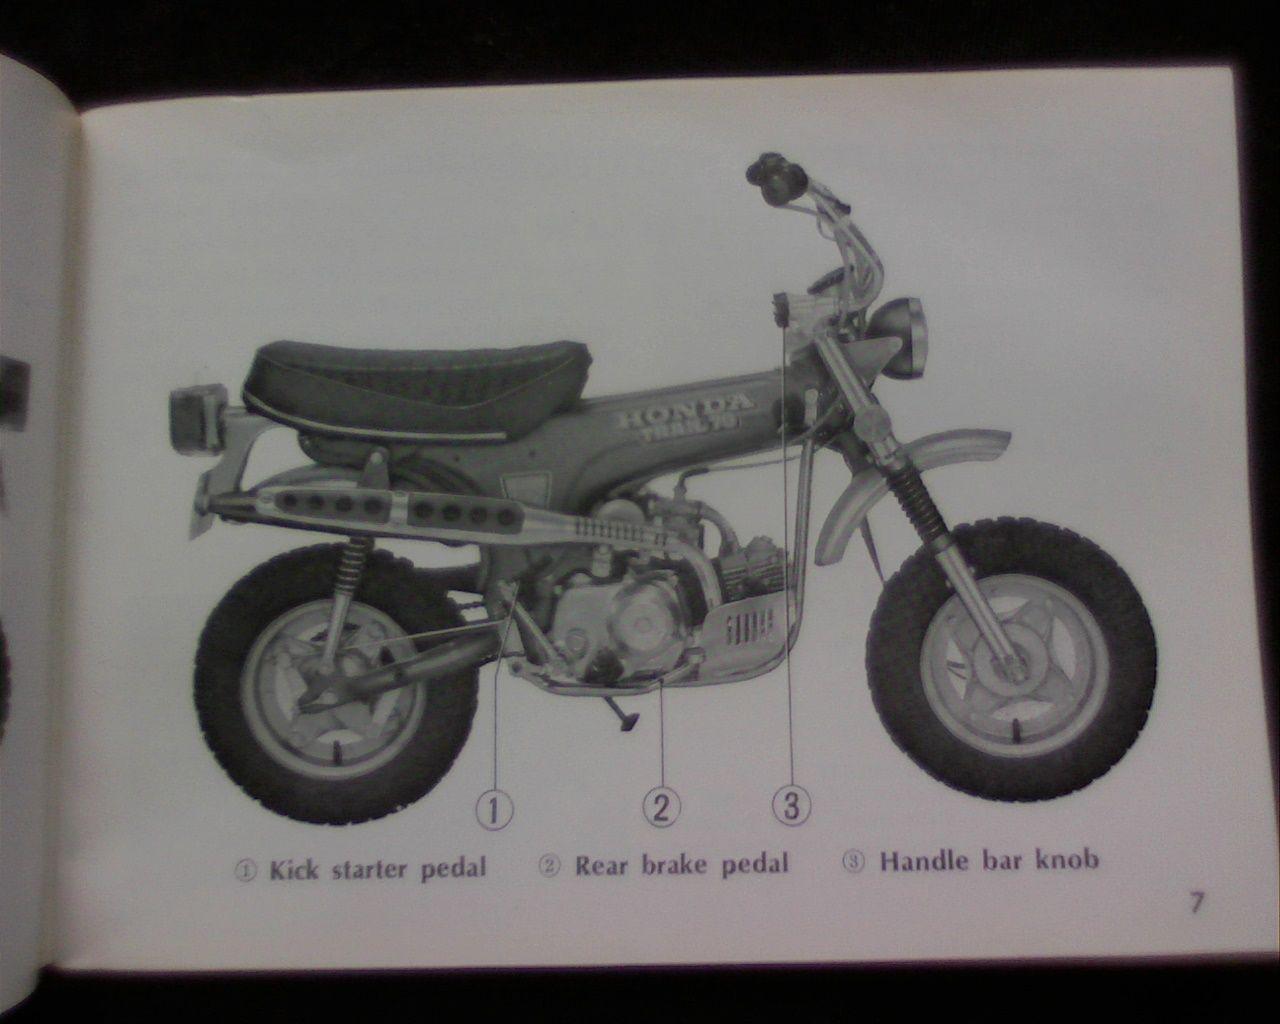 honda ct70 ct 70 mini bike owner manual motocicletas honda 70 cc rh pinterest com au honda motorcycles owner's manual honda motorcycle owners manual download